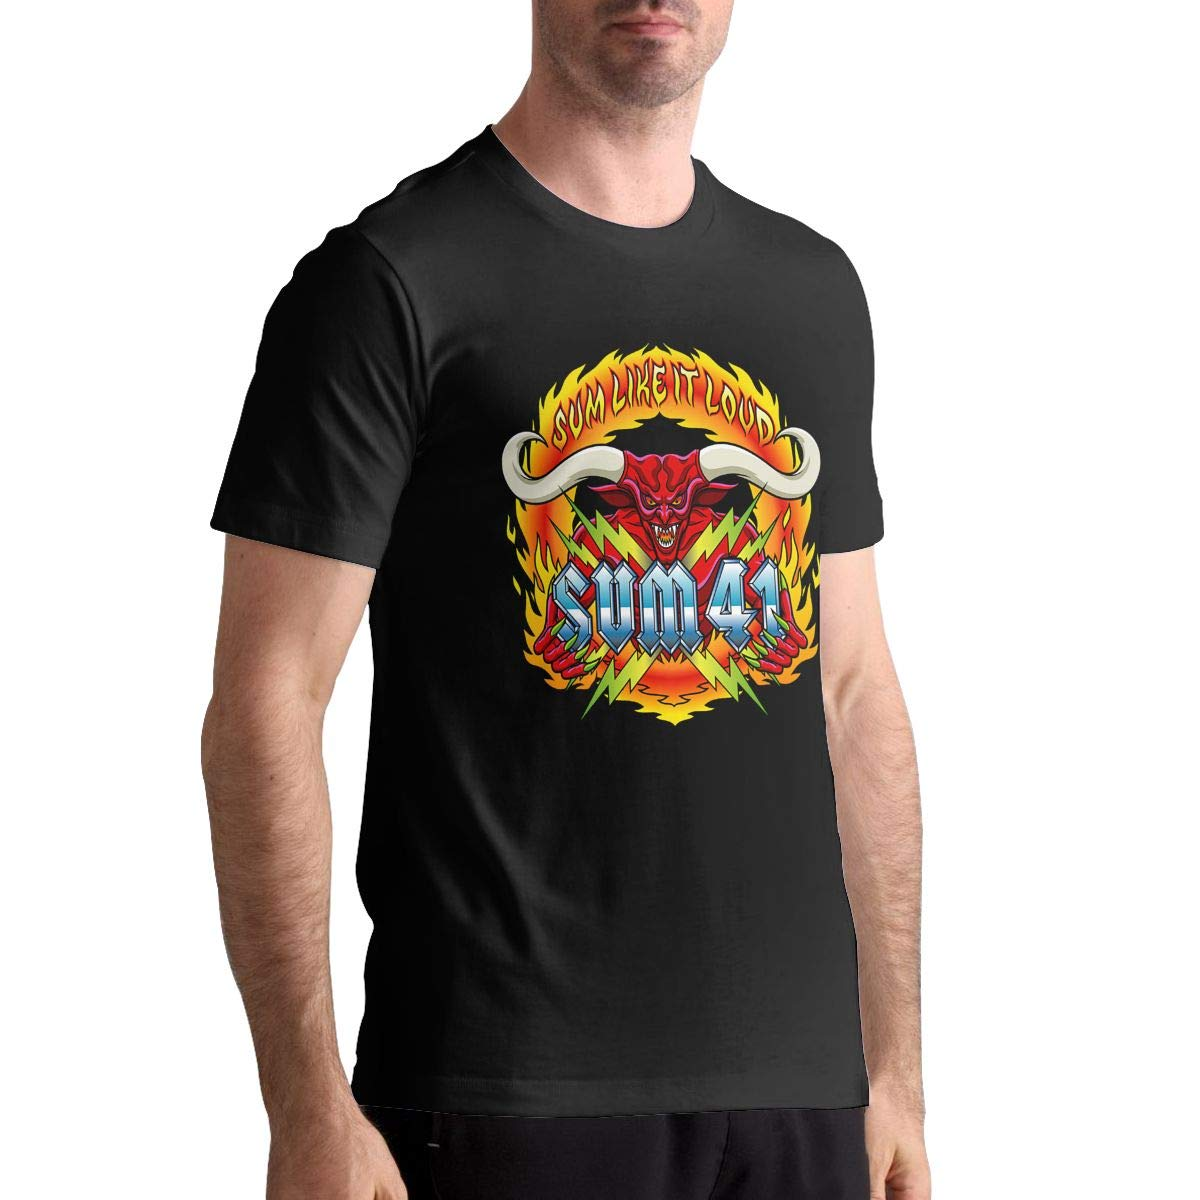 David E Everett Sum 41 Mens T Shirt Cotton Fashion Sports Casual Round Neck Short Sleeve Tees